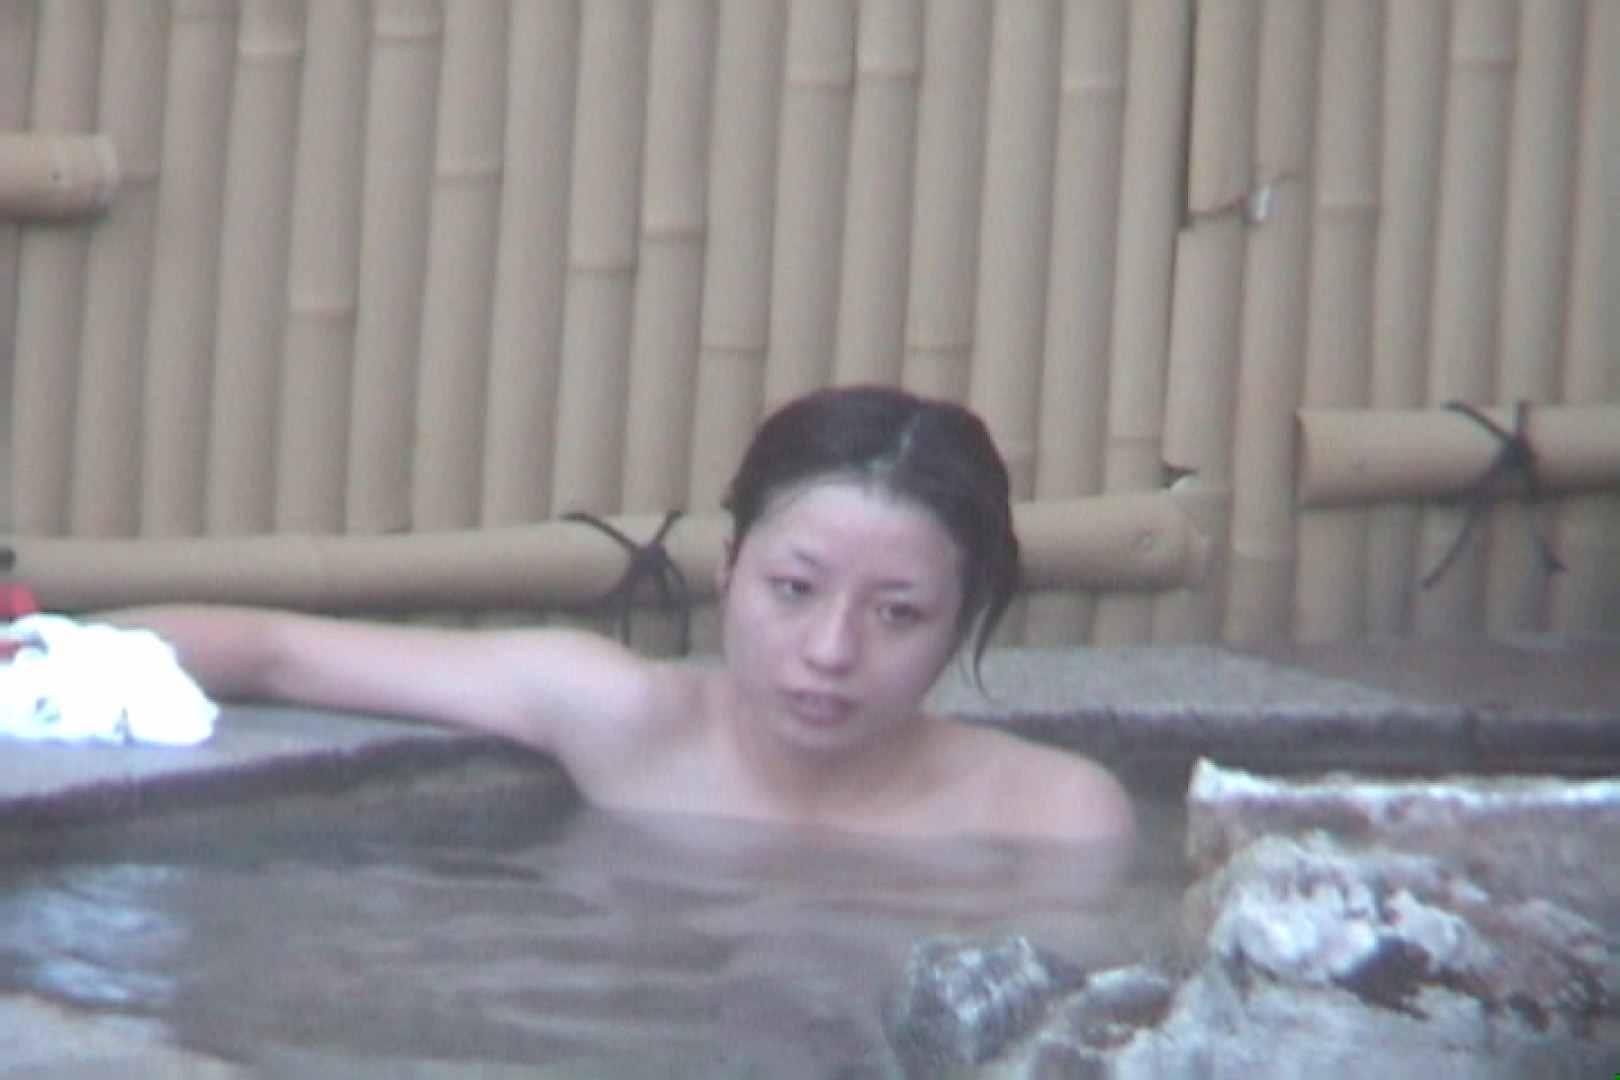 Aquaな露天風呂Vol.608 HなOL | 盗撮  89pic 40